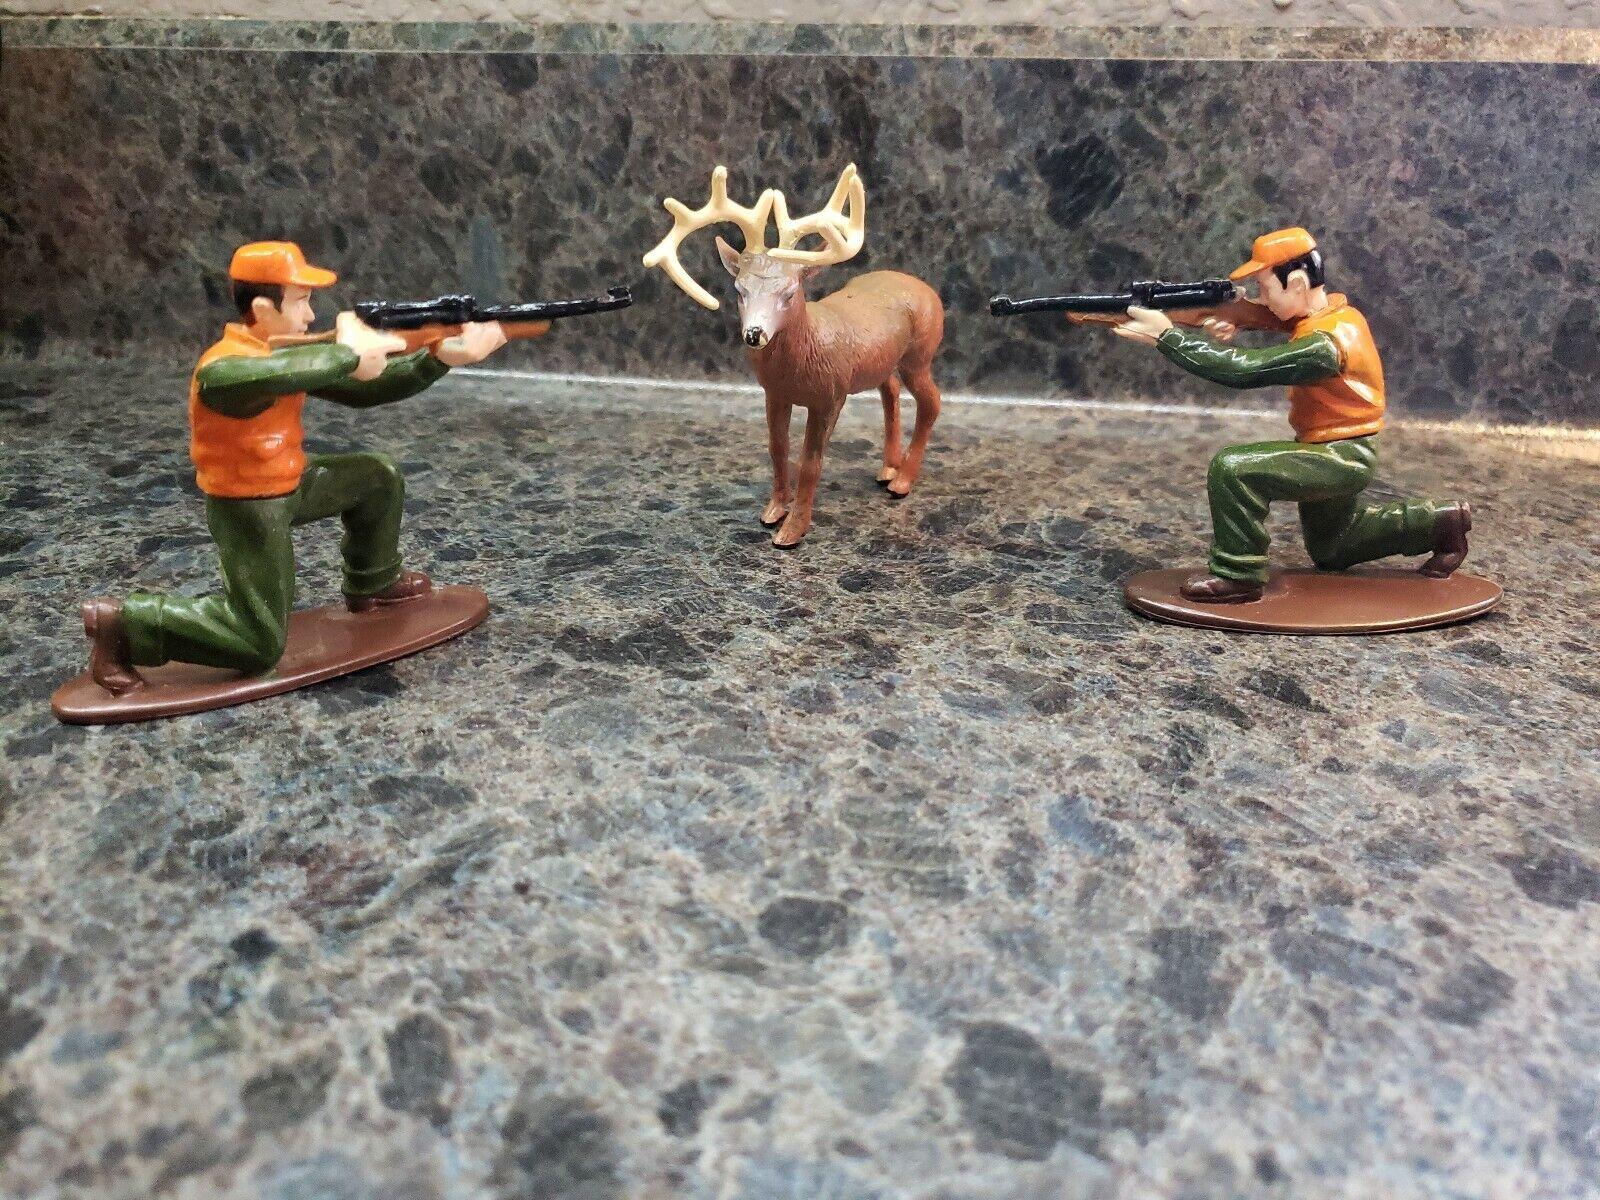 Decopac Deer Hunting Cake Decorating Set Birthday Hunter and Deer Figurine